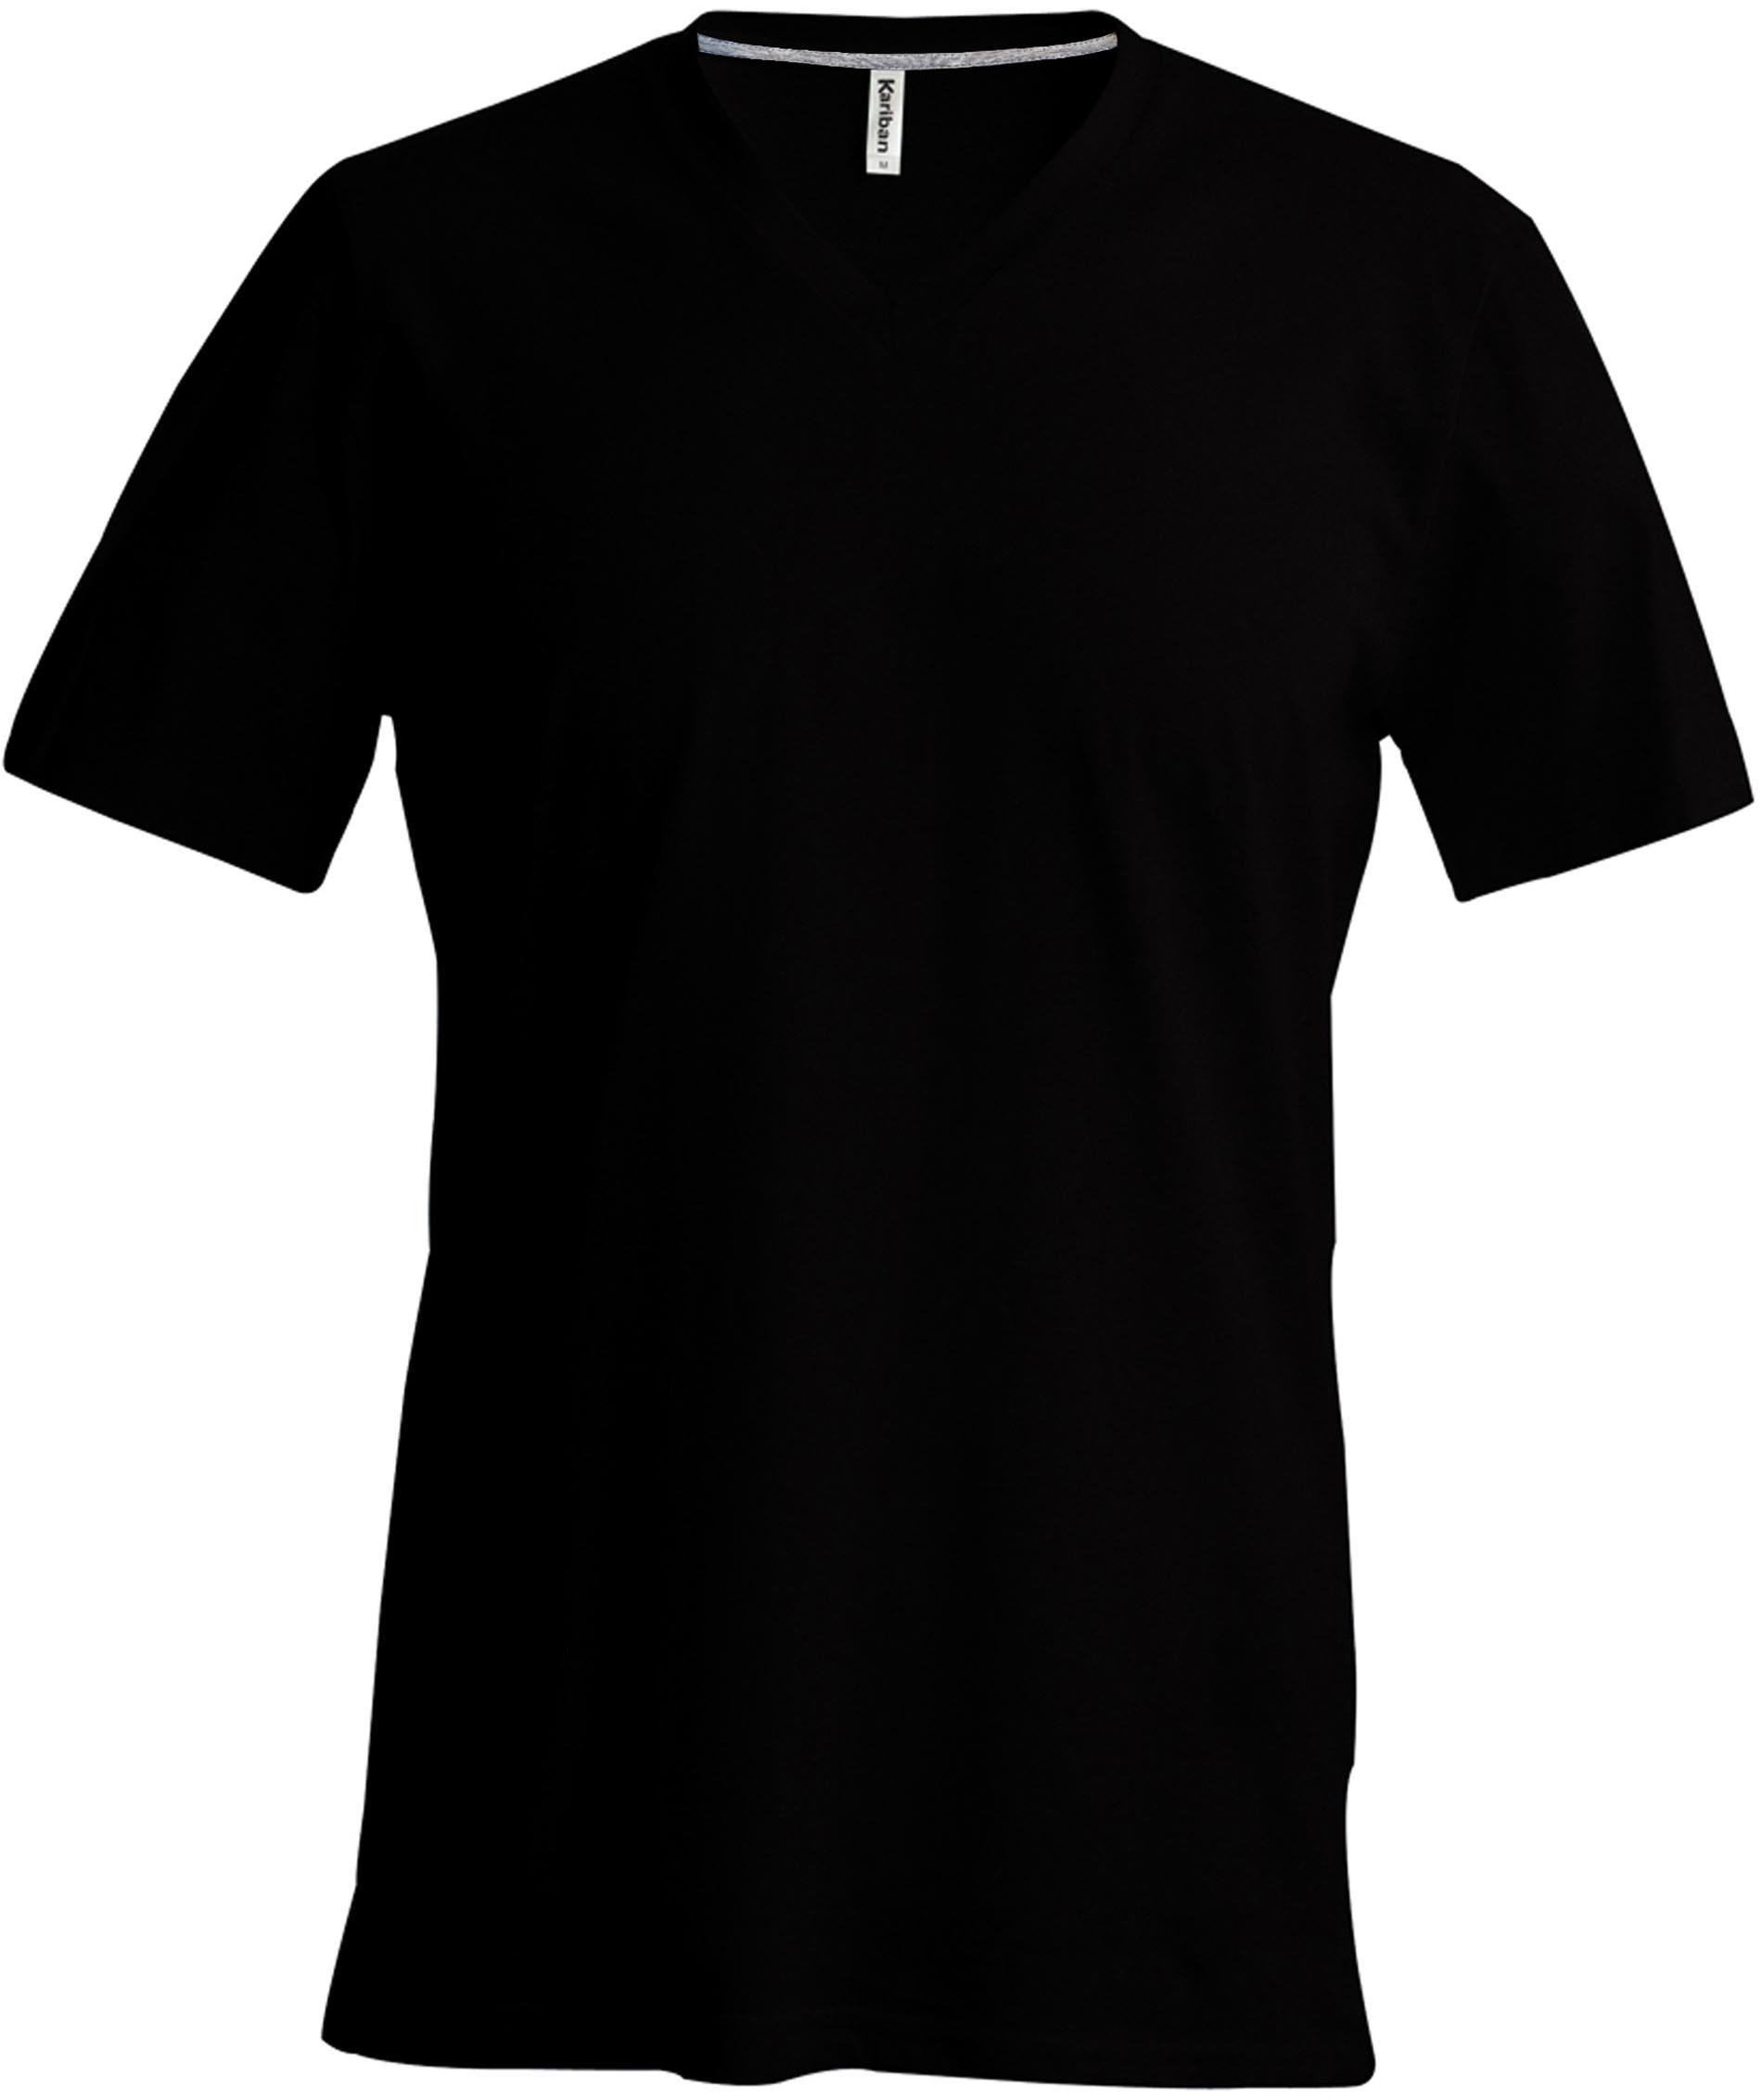 Kariban K356 Black